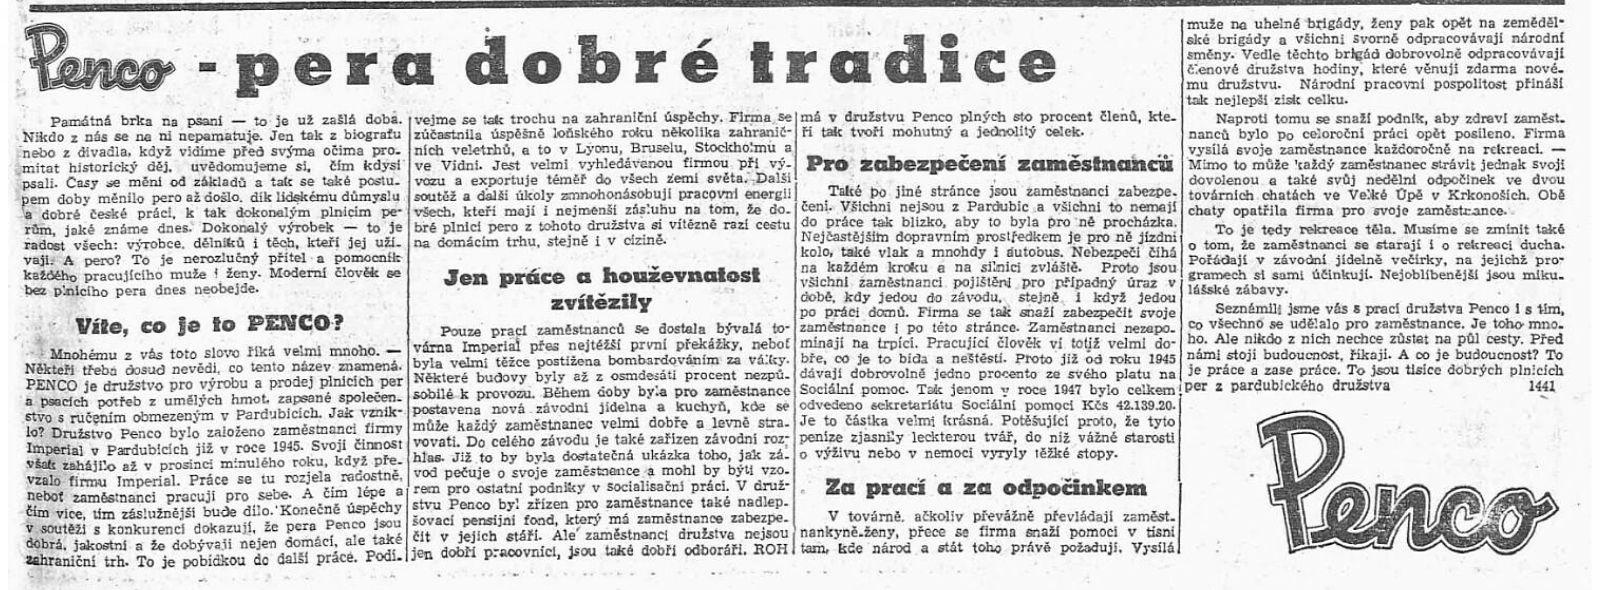 Penco - pera dobré tradice (Svobodné slovo, 28. 04.1948, s. 5)